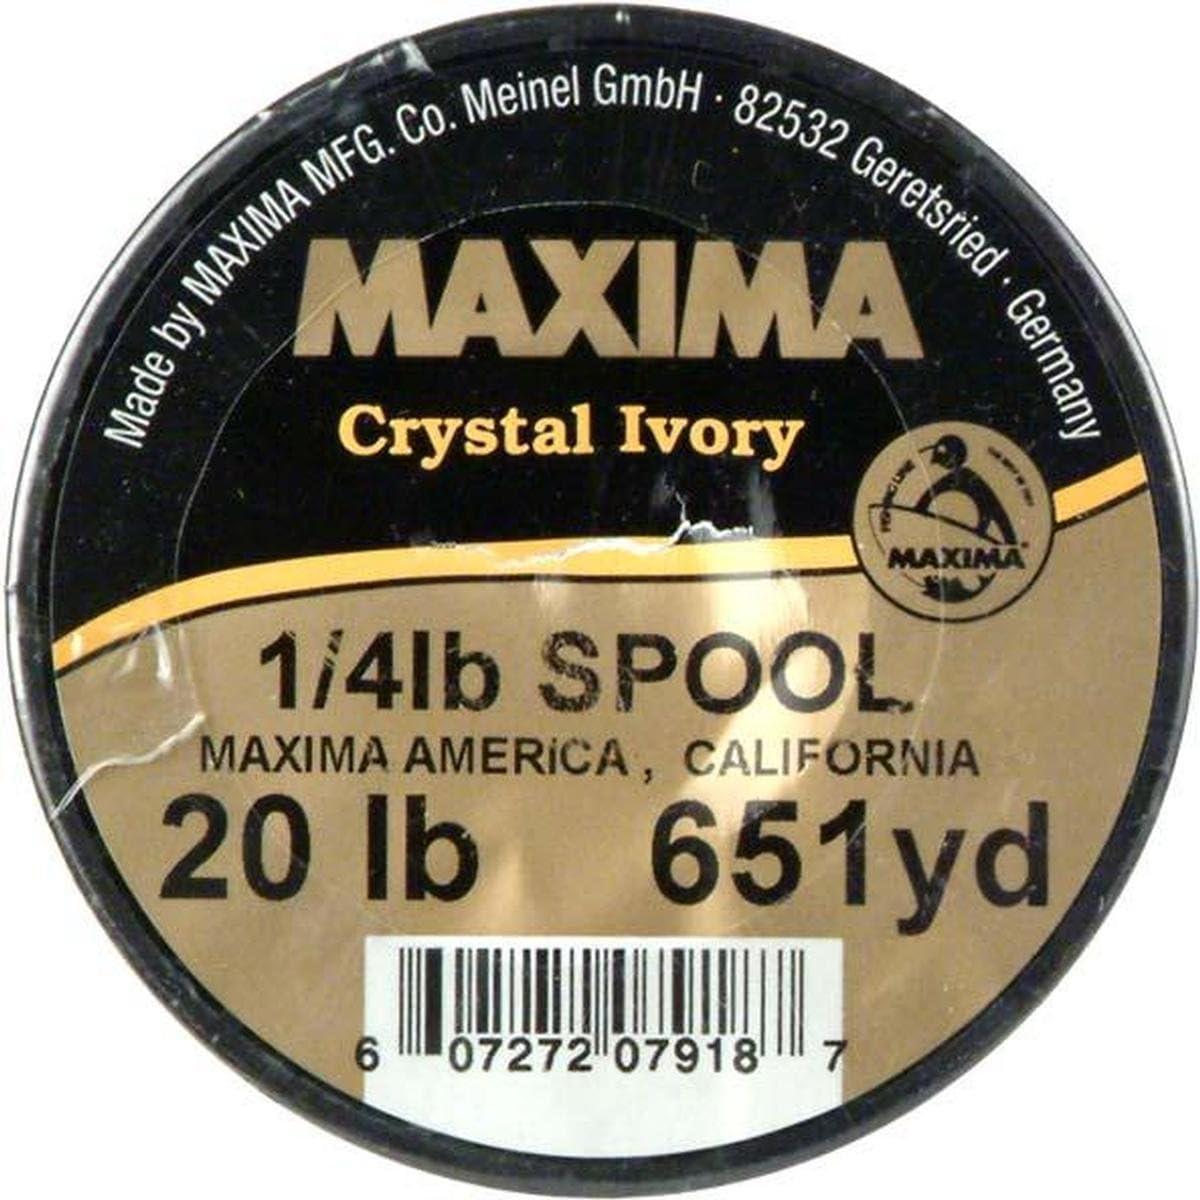 Maxima Crystal Ivory Monofilament Guide Spools Gold Monofilament Fishing Line